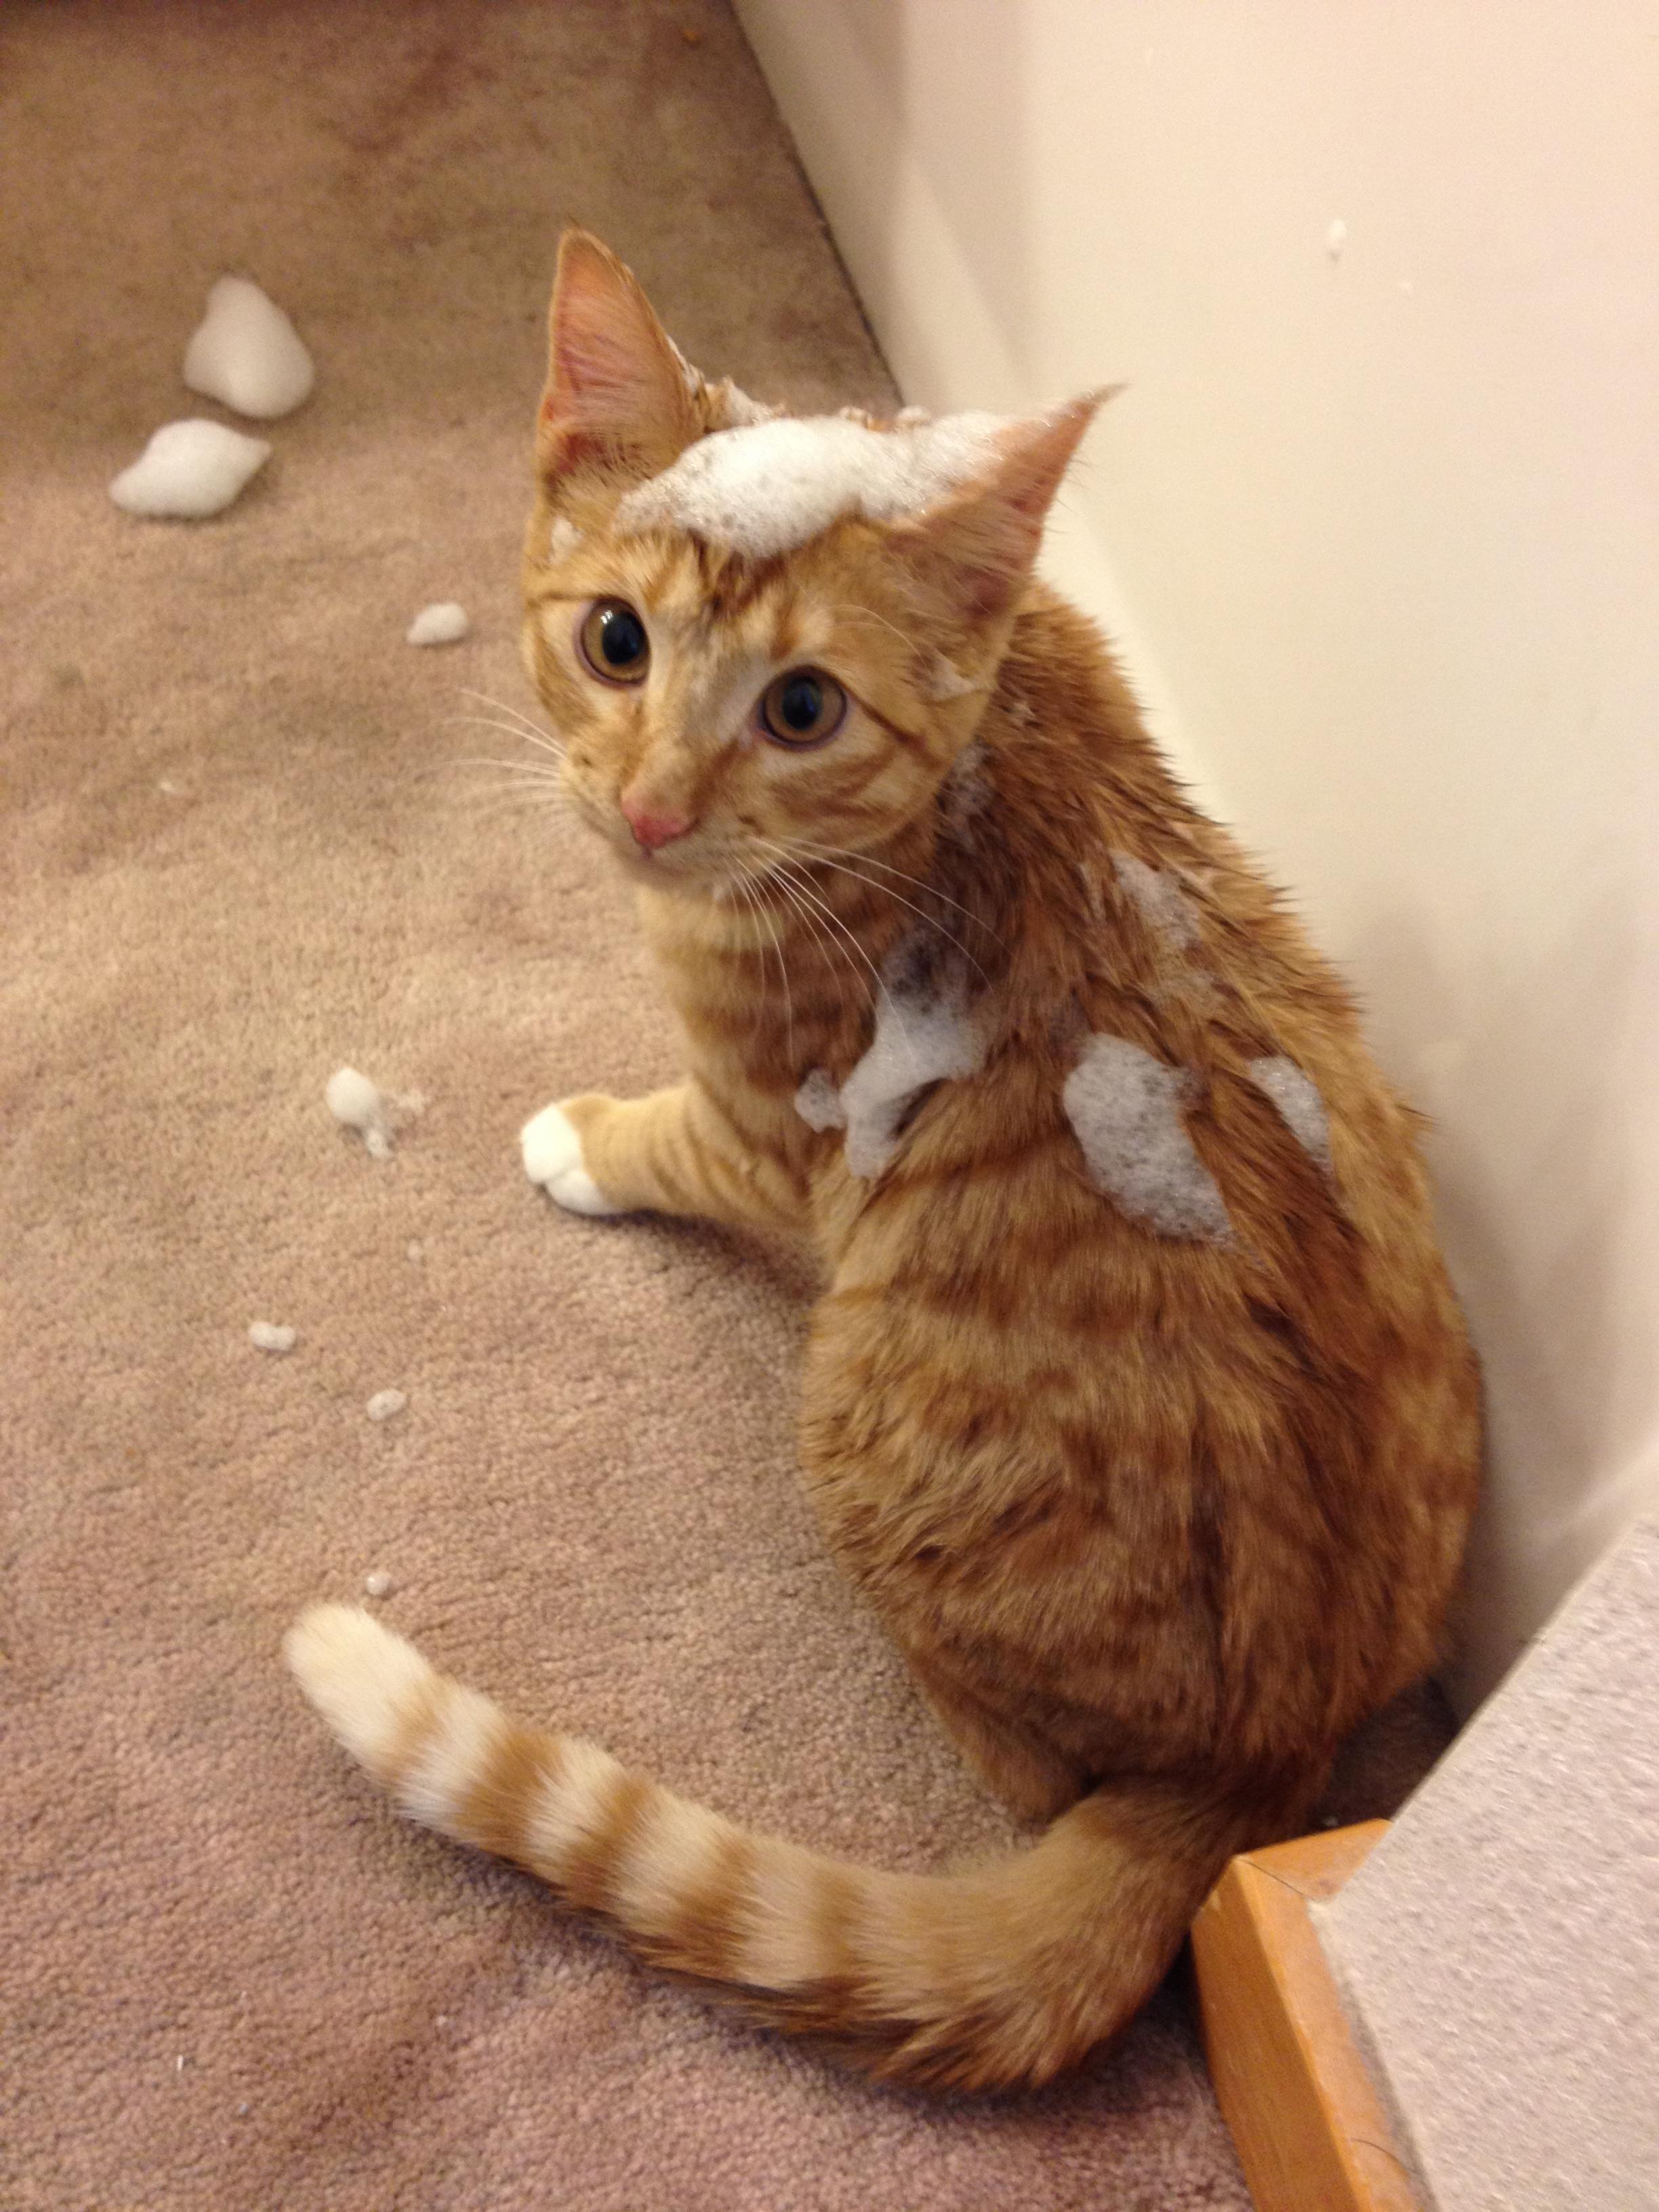 Girlfriend Was Taking A Bath Kitten Got A Little Too Curious Orange Tabby Cats Kitten Cat Tail